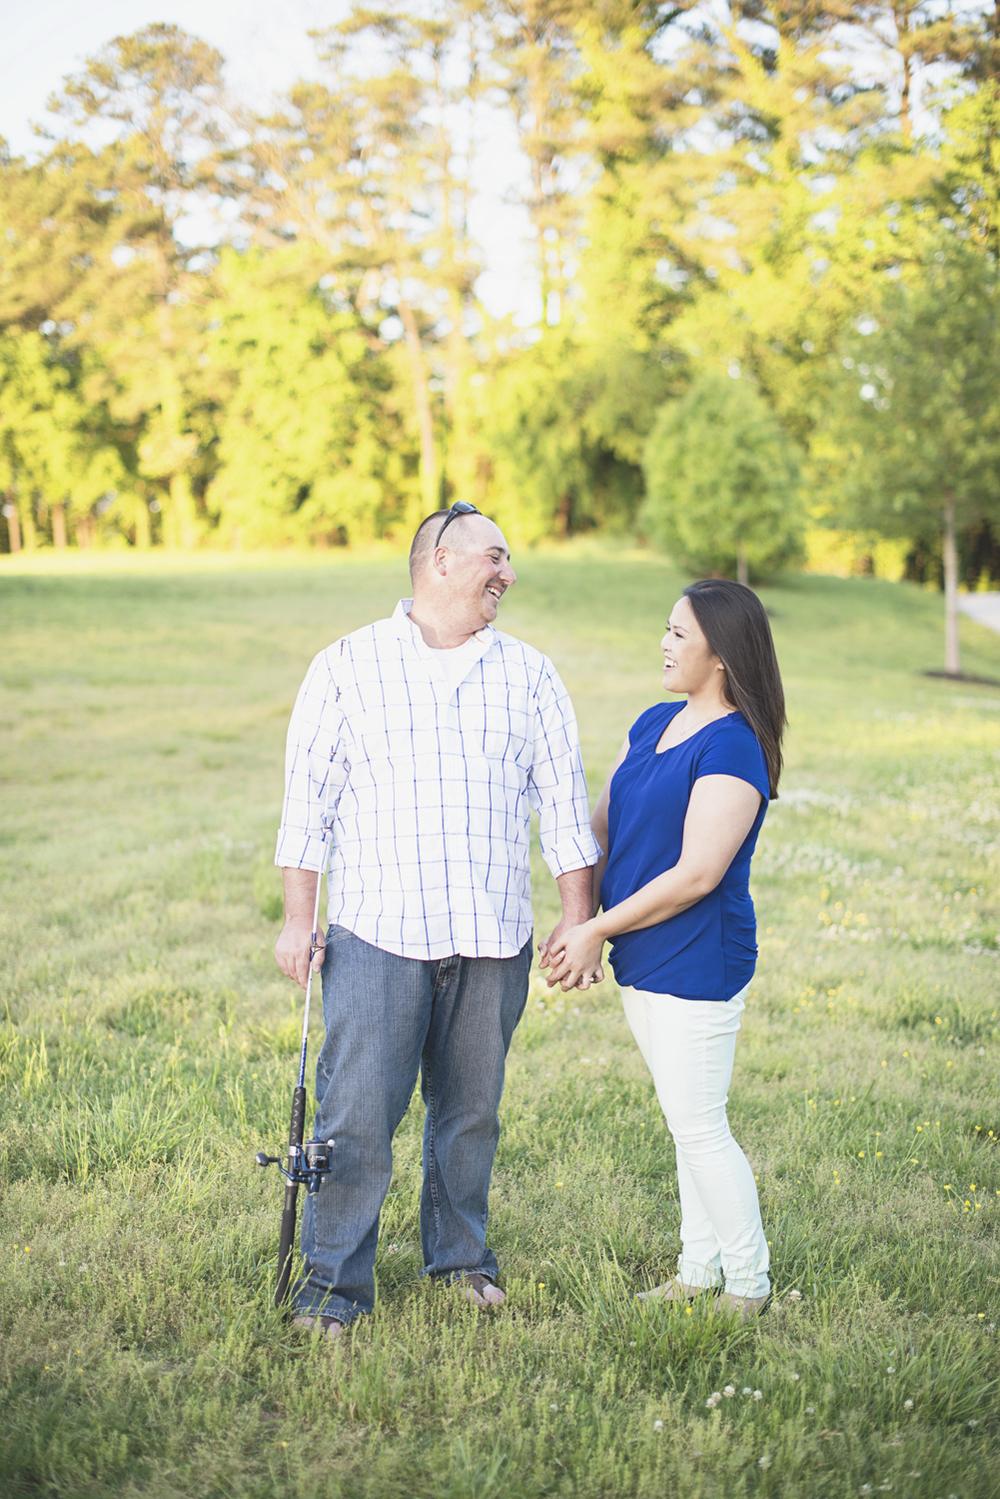 Windsor Castle Park Engagement Session in Smithfield, Virginia | Fishing pole